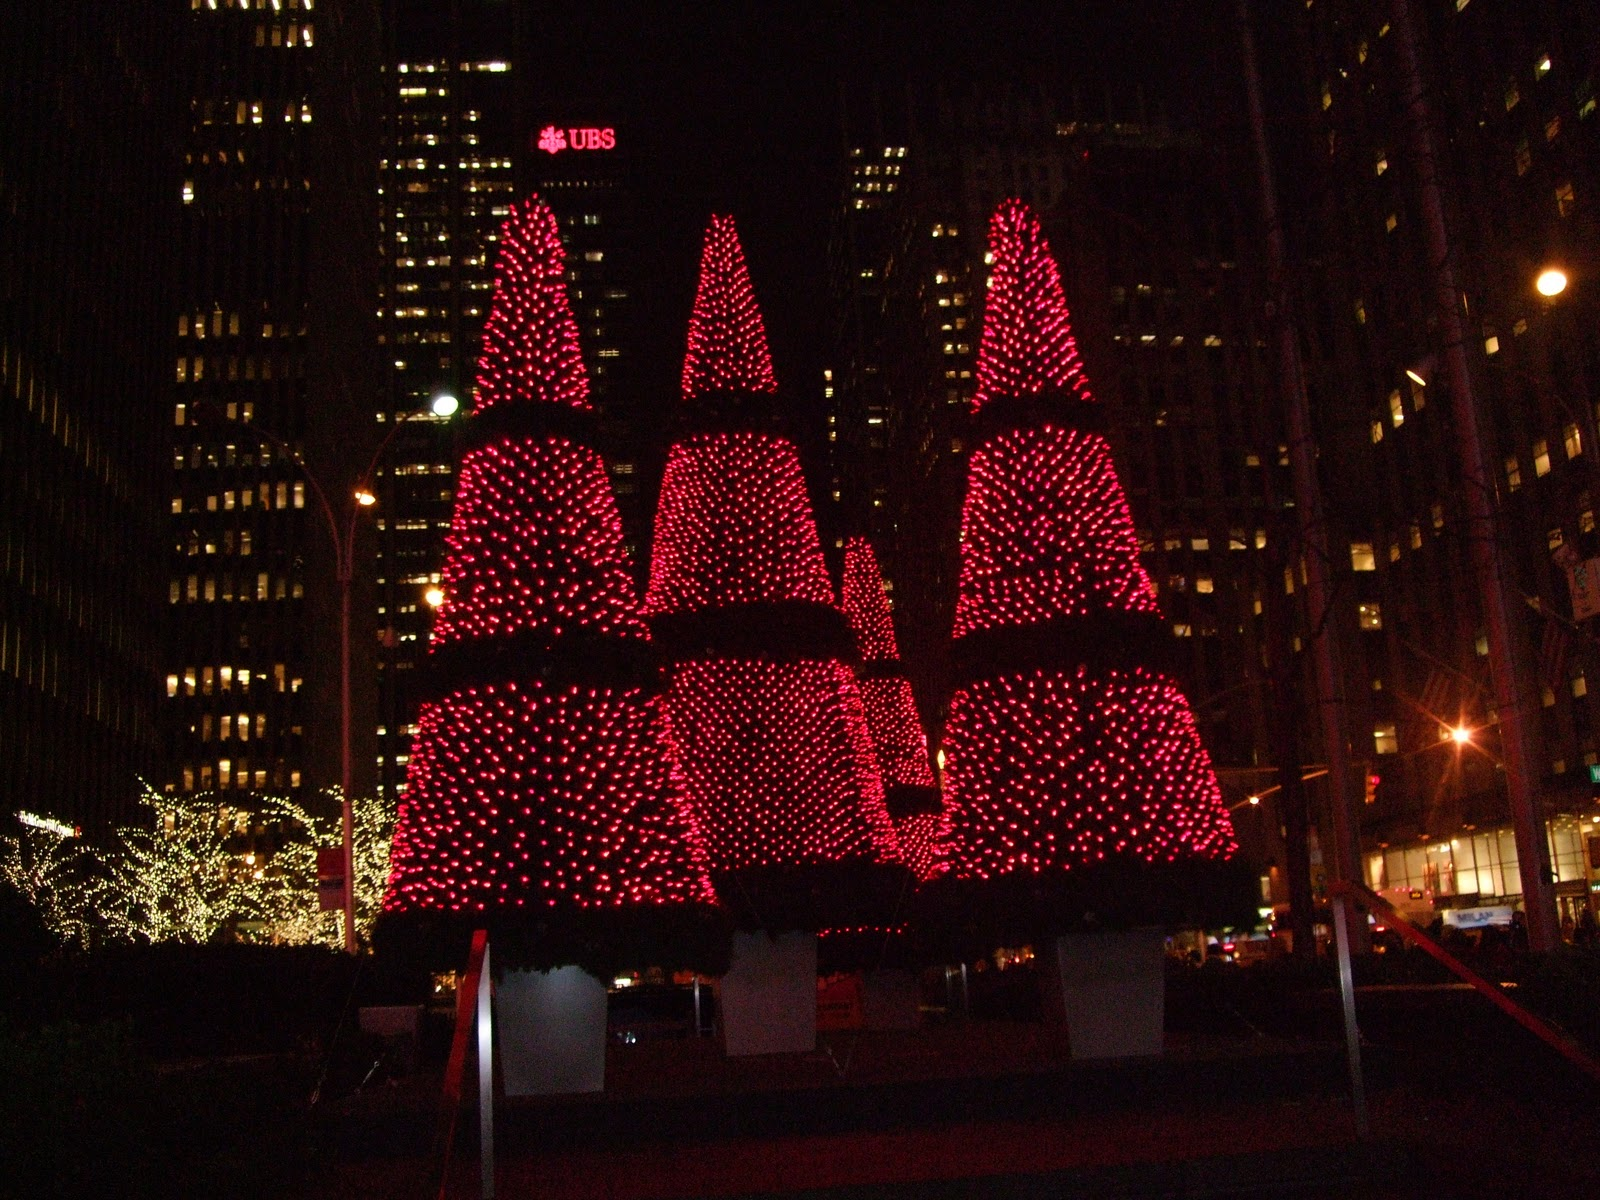 Christmas in new york phillip 39 s natural world 1 0 3 for Christmas in new york what to do